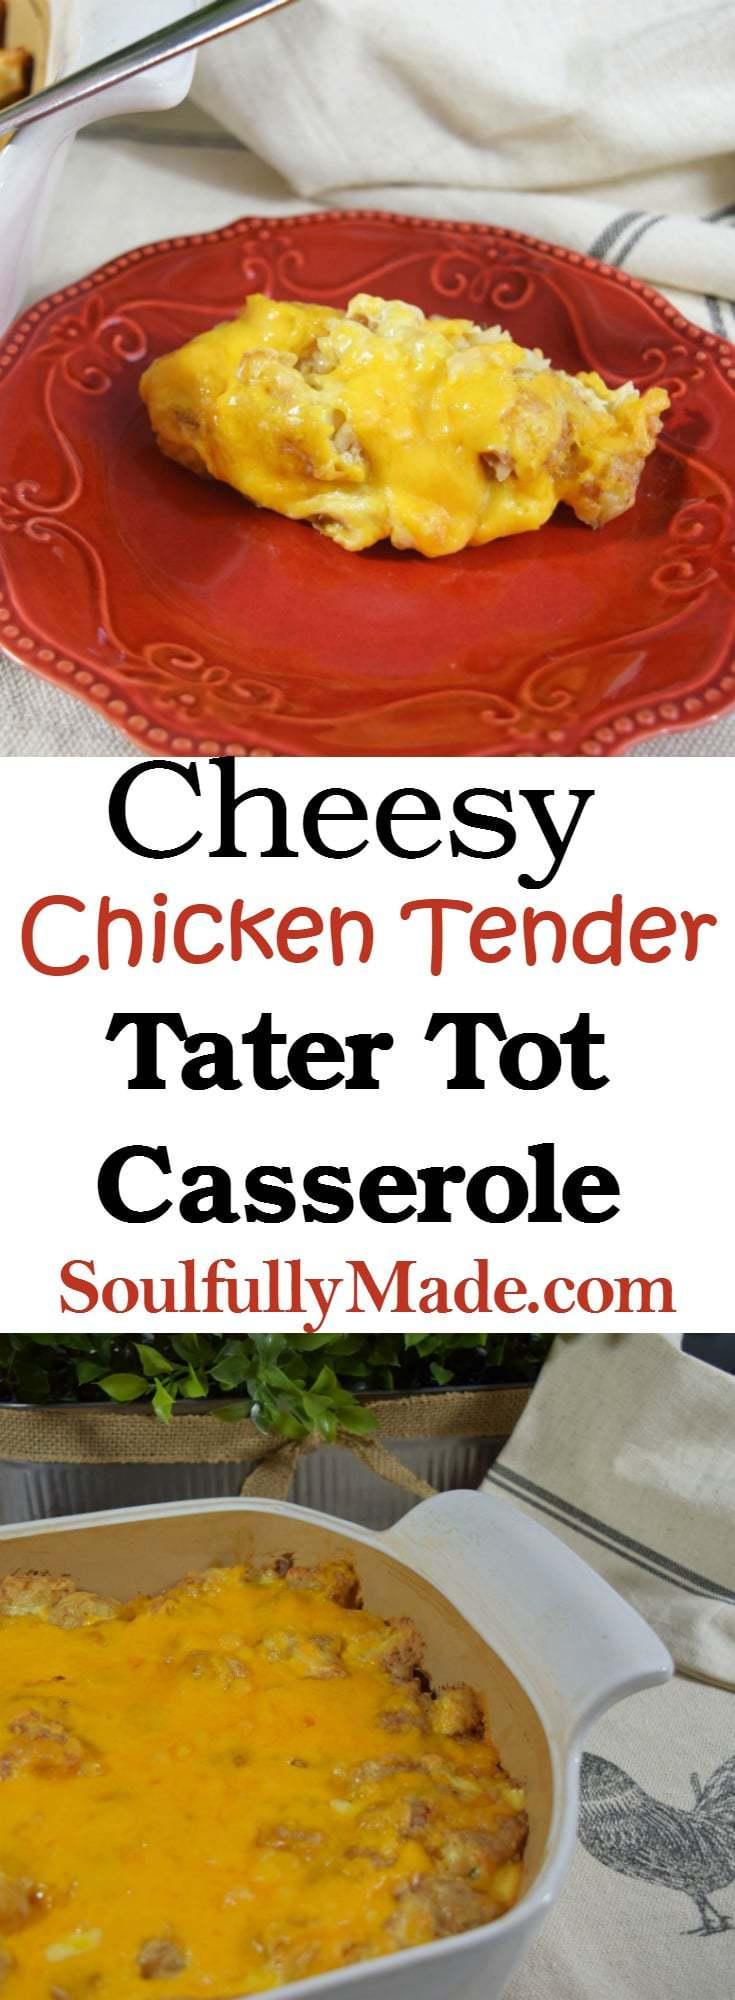 Cheesy Chicken Tender Tater Tot Casserole